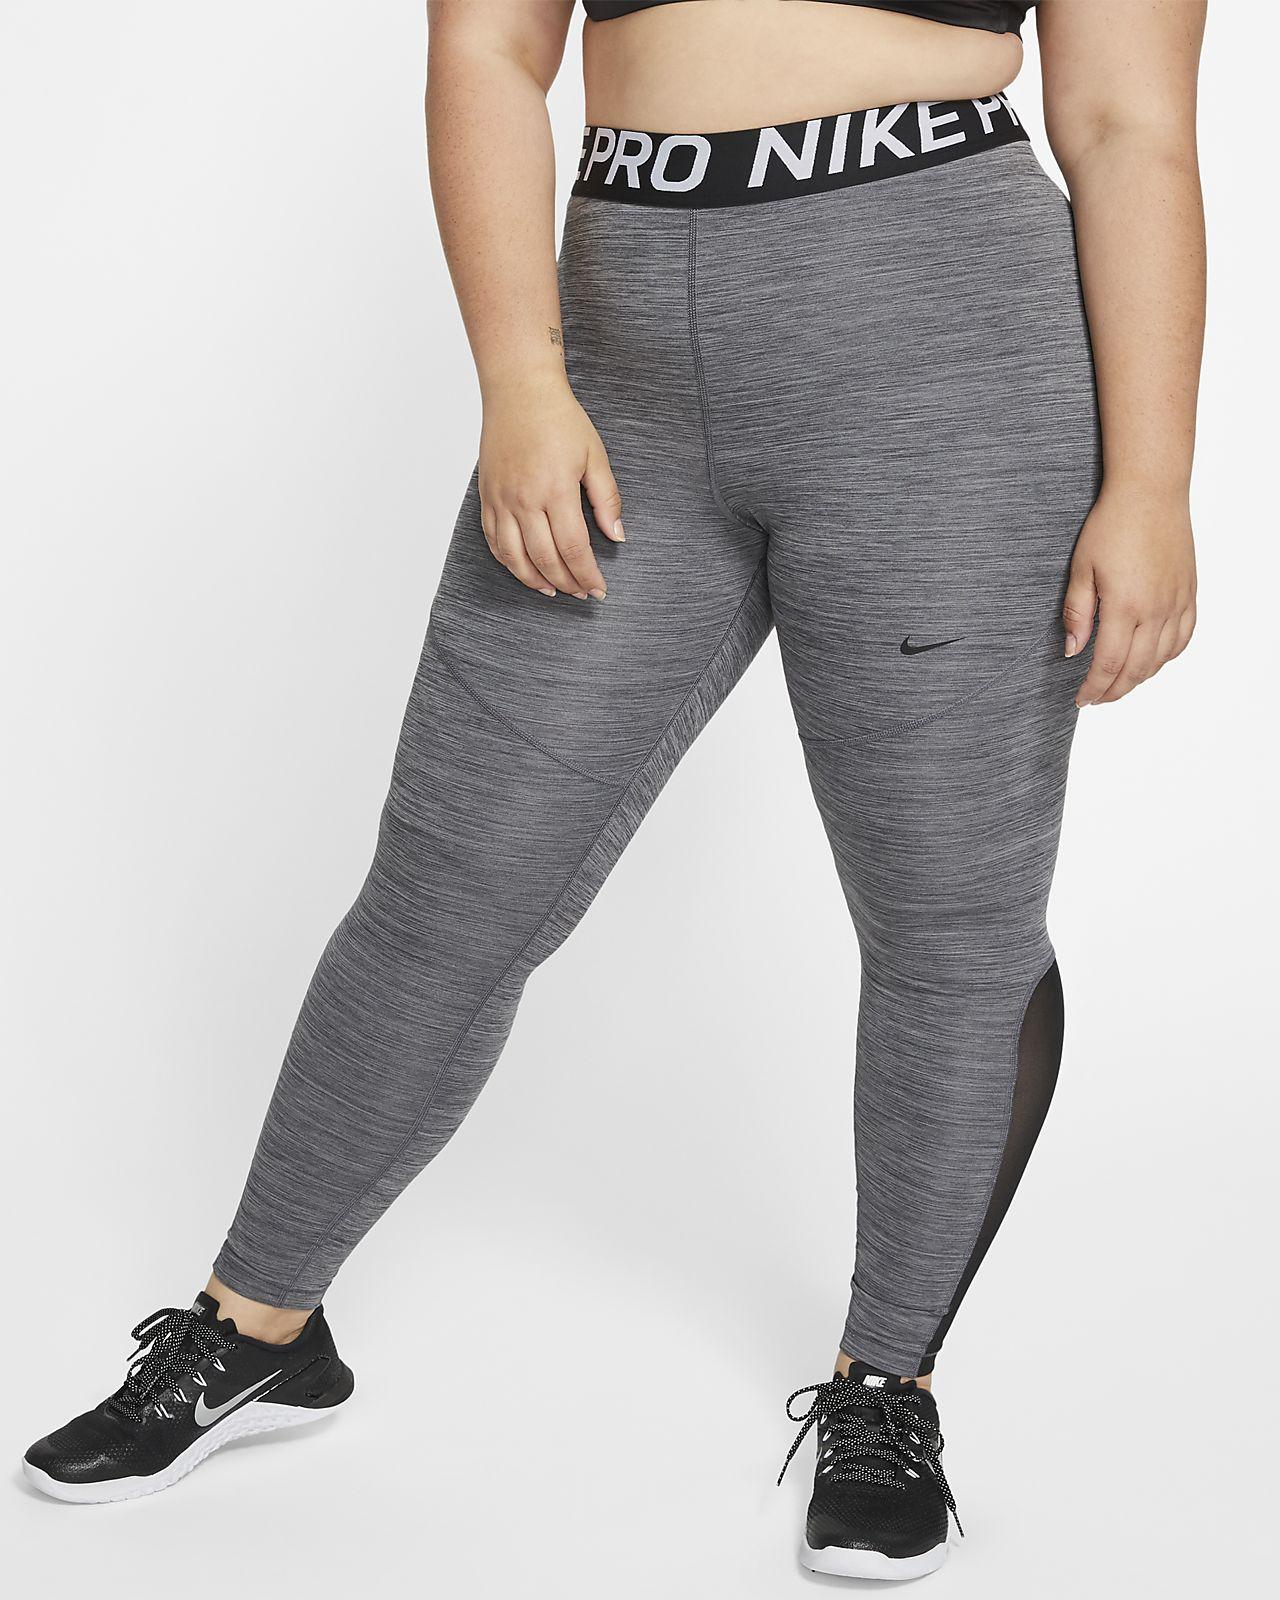 Nike Pro Women's Tights (Plus Size)